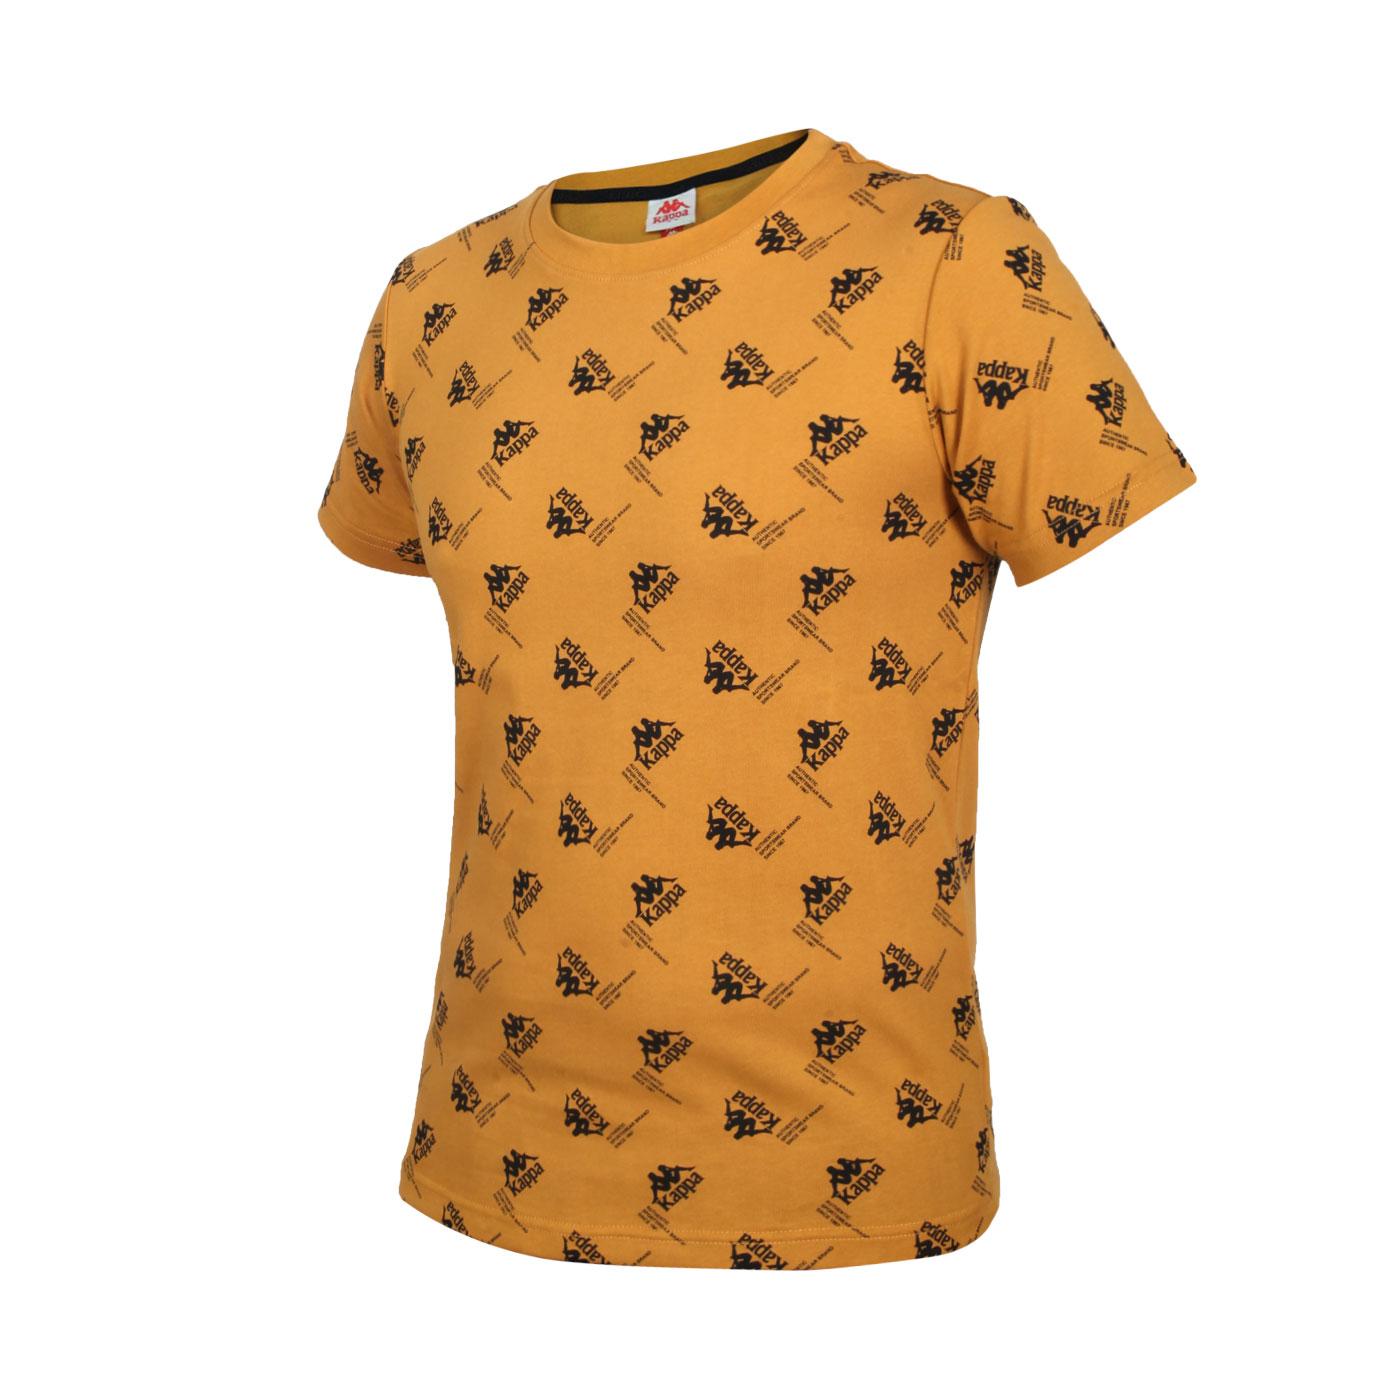 KAPPA 男款短袖T恤 321876W-Z07 - 棕黑